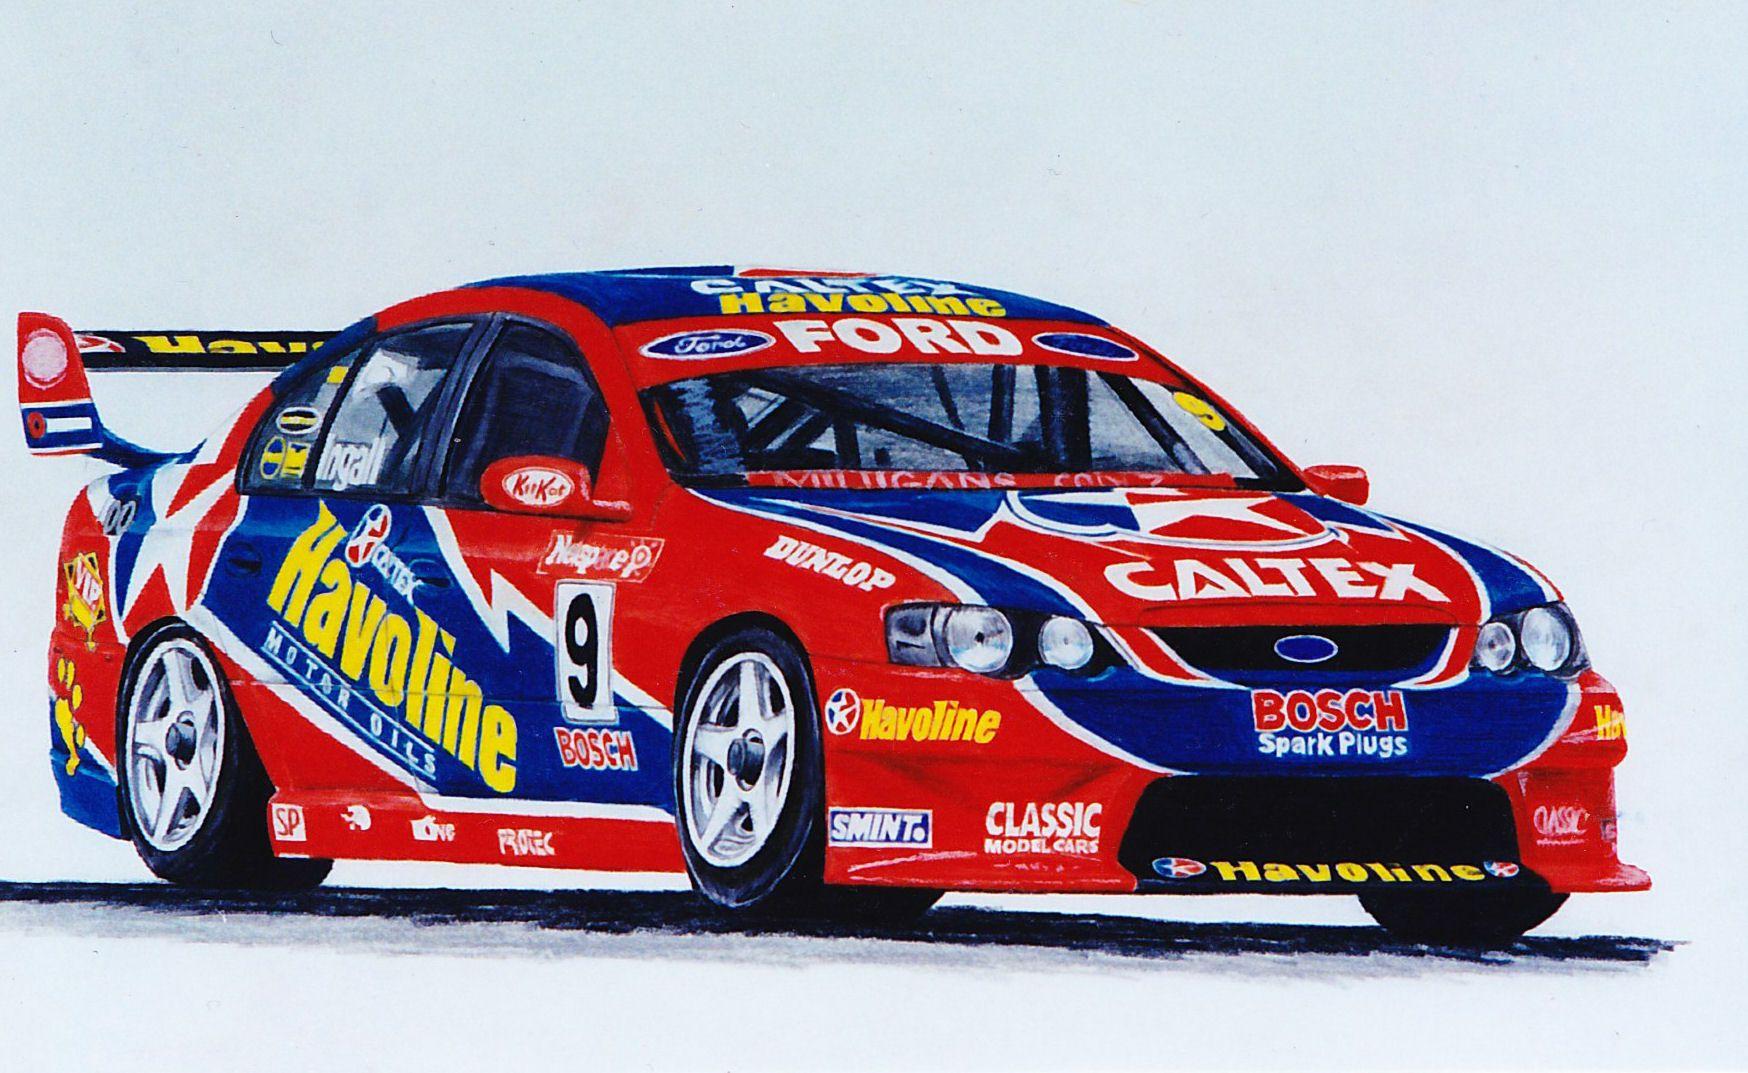 Russell Ingall Ba Falcon Super Cars Australian Cars Aussie Muscle Cars